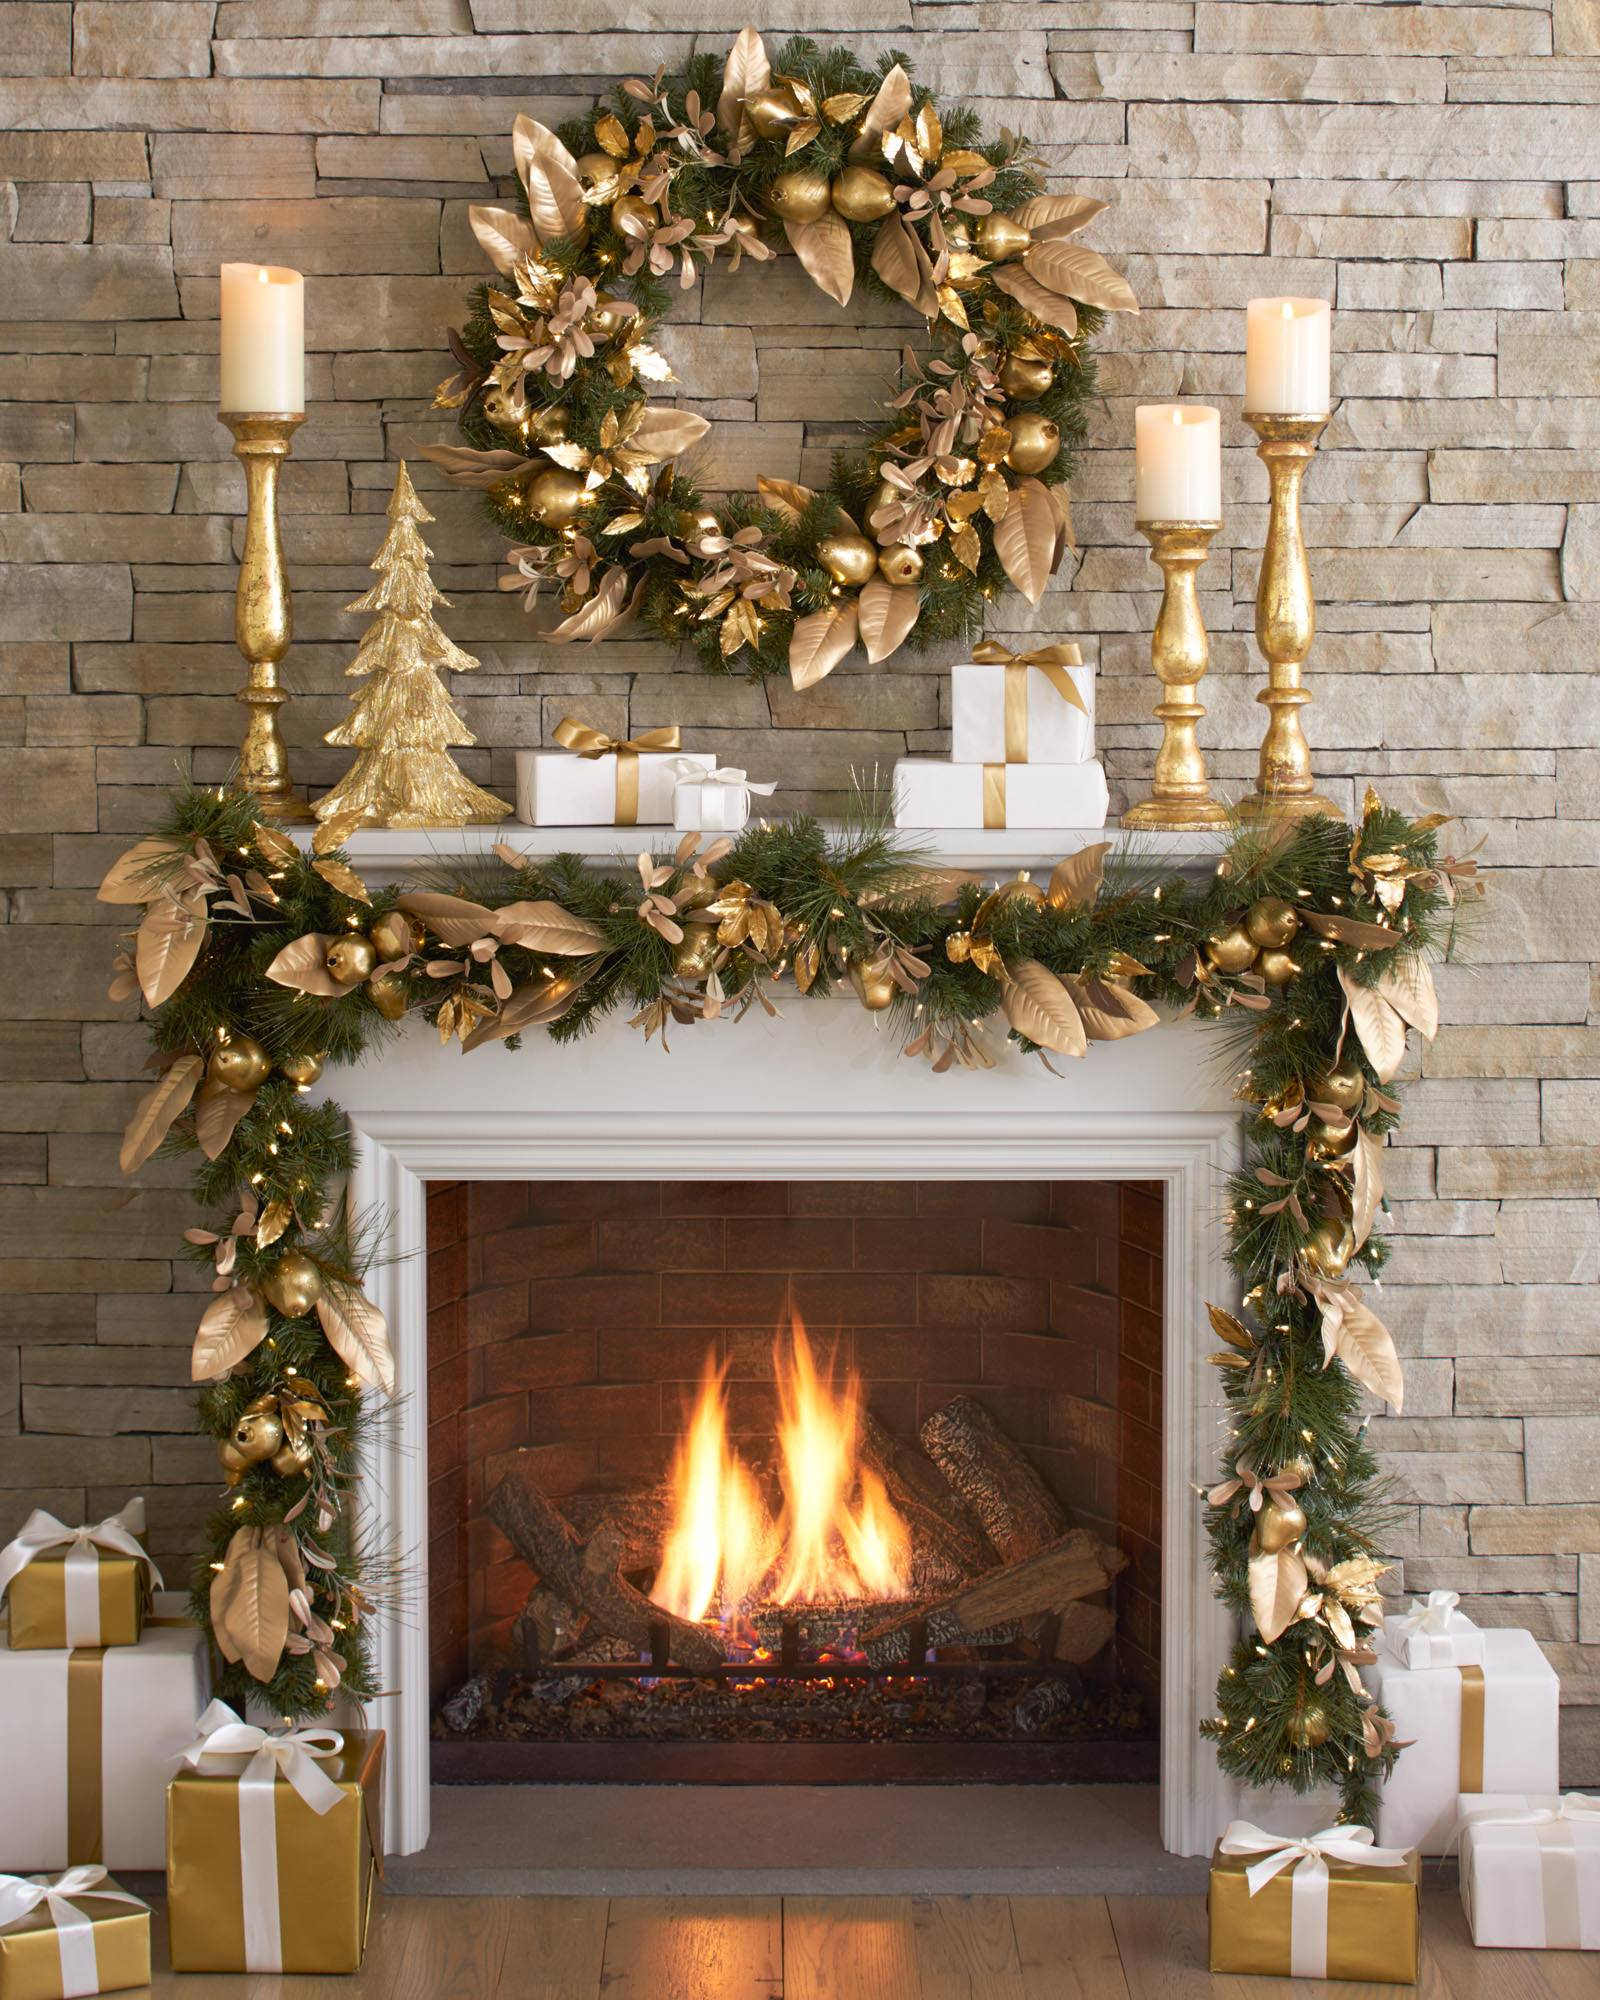 ... Golden Christmas Tabletop Trees, Set of 3 Alt